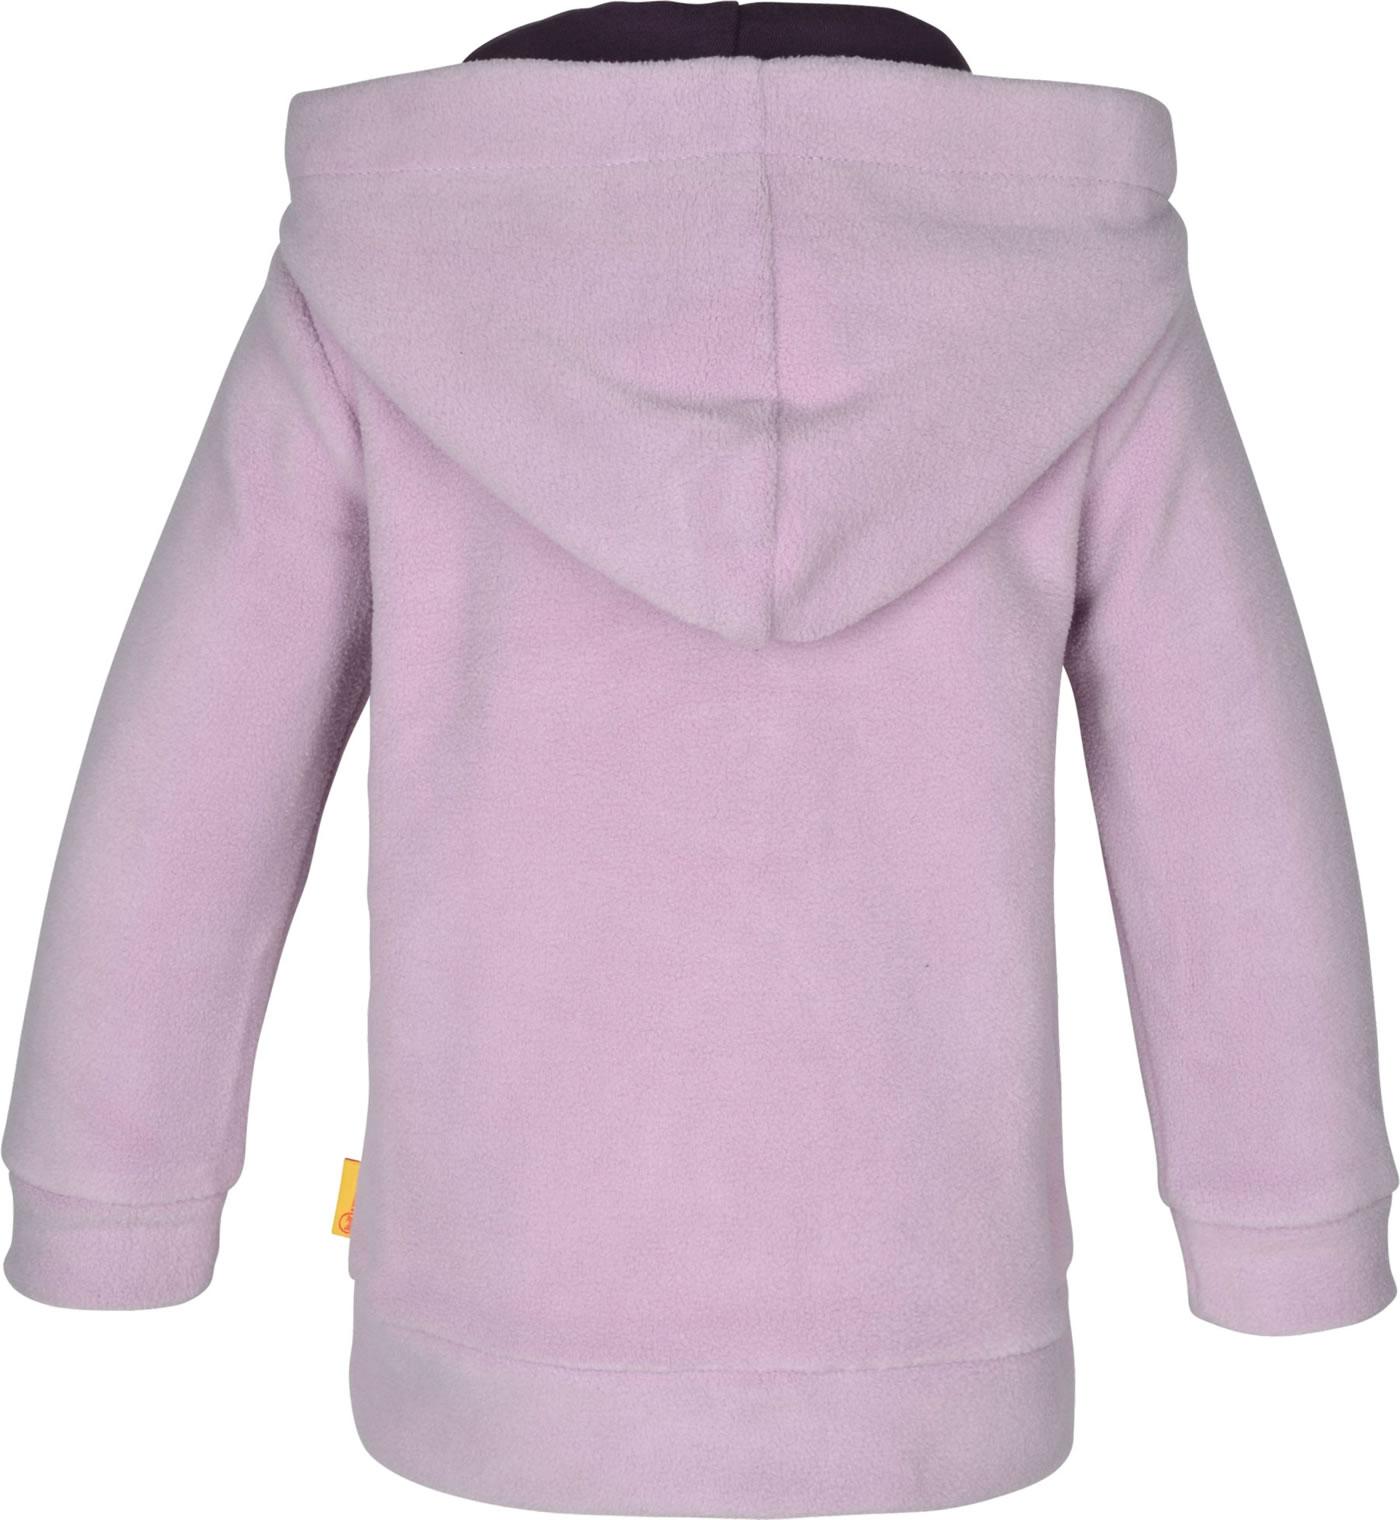 Steiff Sweat shirt NATURAL BERRY lavender mist 1921221 7020